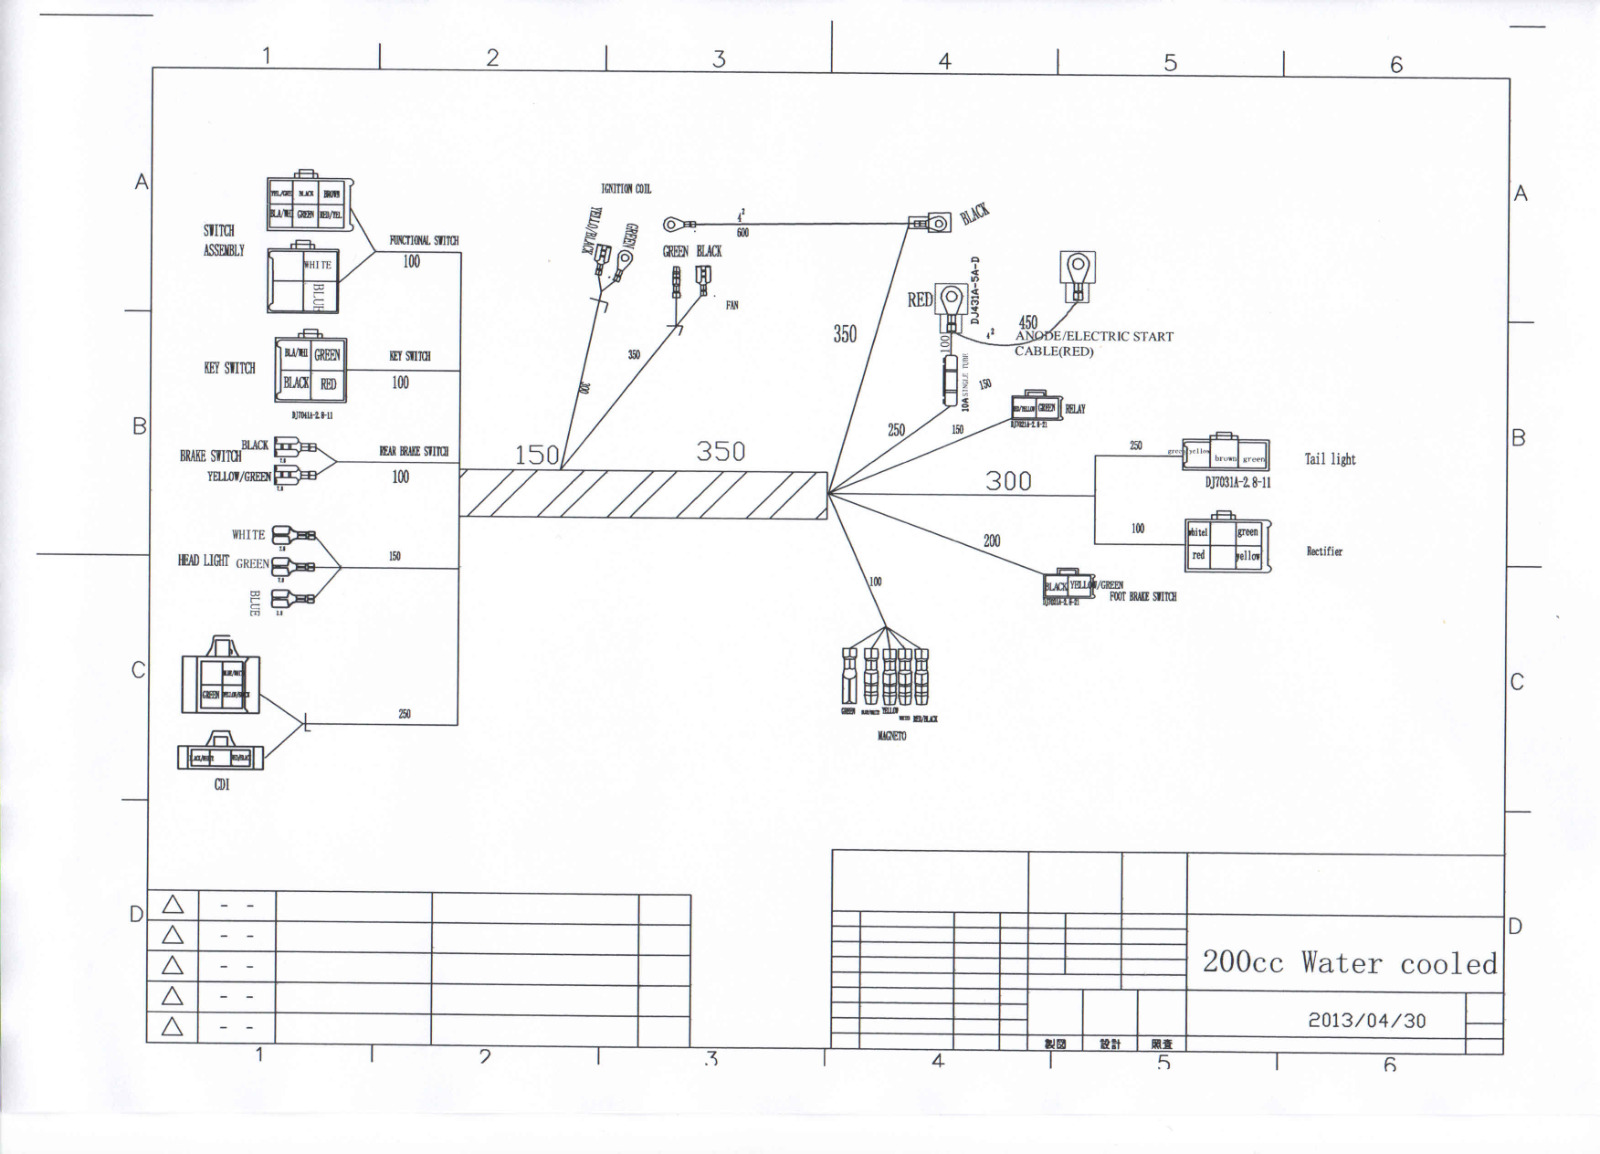 Kazuma 110Cc Atv Wiring Diagram from static-cdn.imageservice.cloud